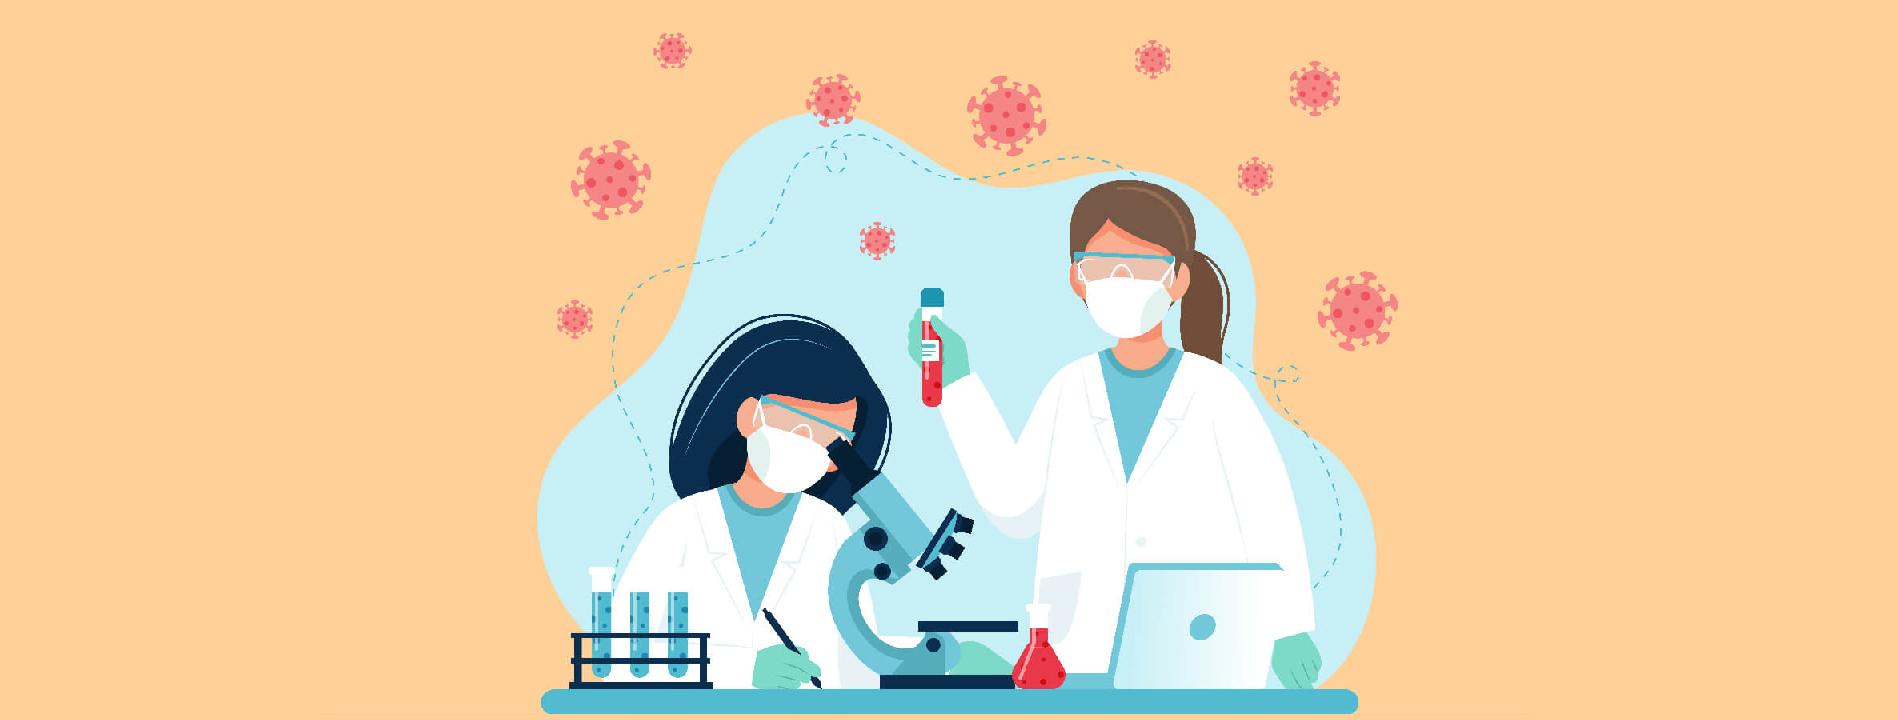 Should You Participate in a Covid-19 Clinical Trial?